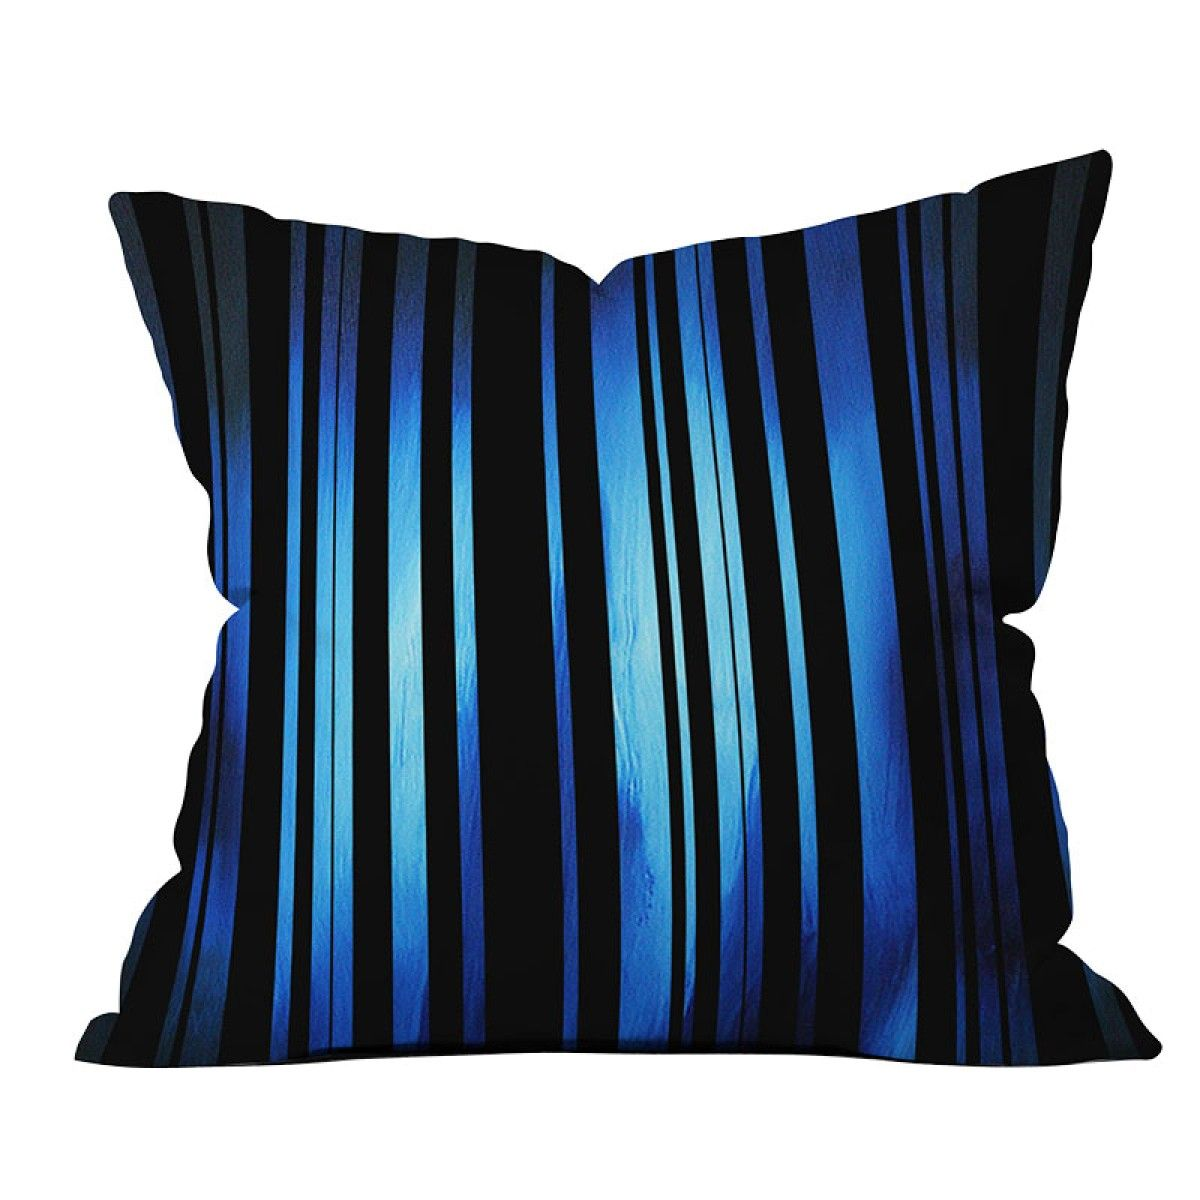 and pillow black bed pillows white target throw cheap bath beyond